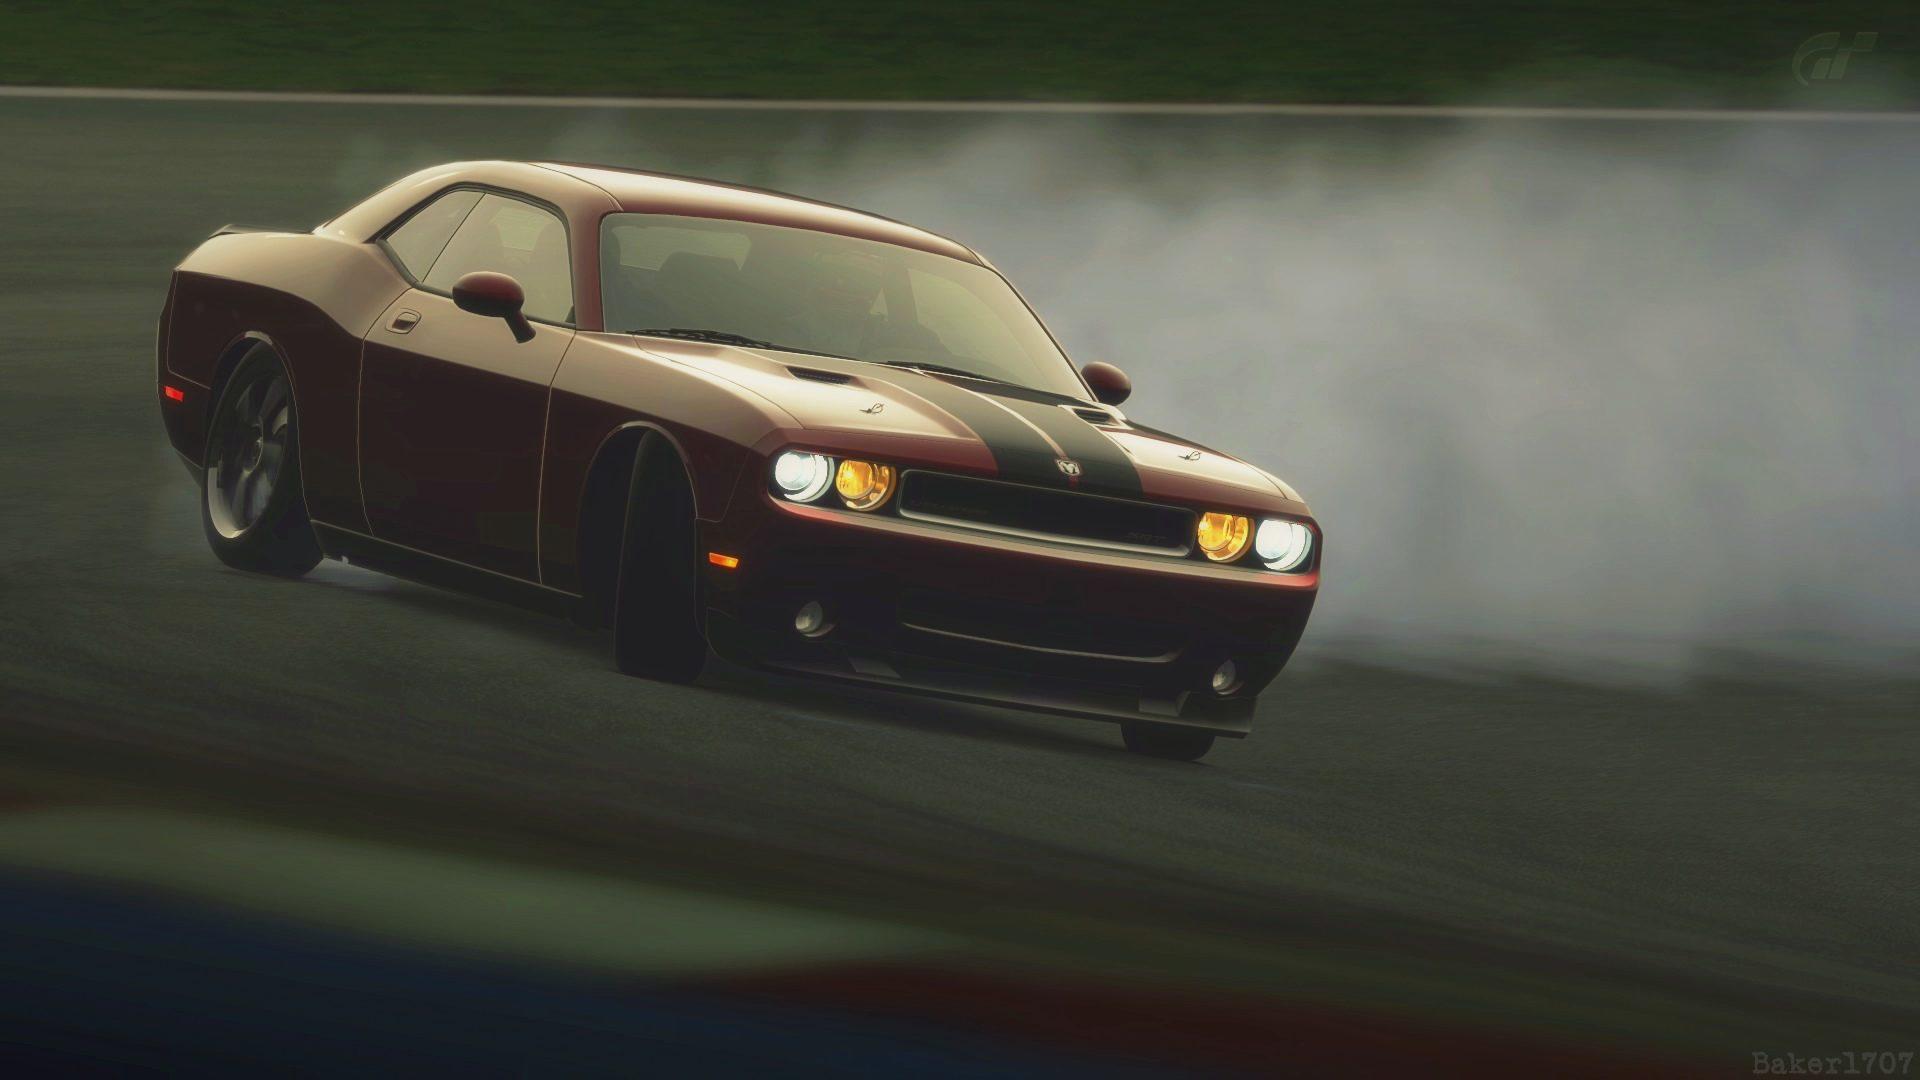 Mid-Field Raceway_64 edit.jpg